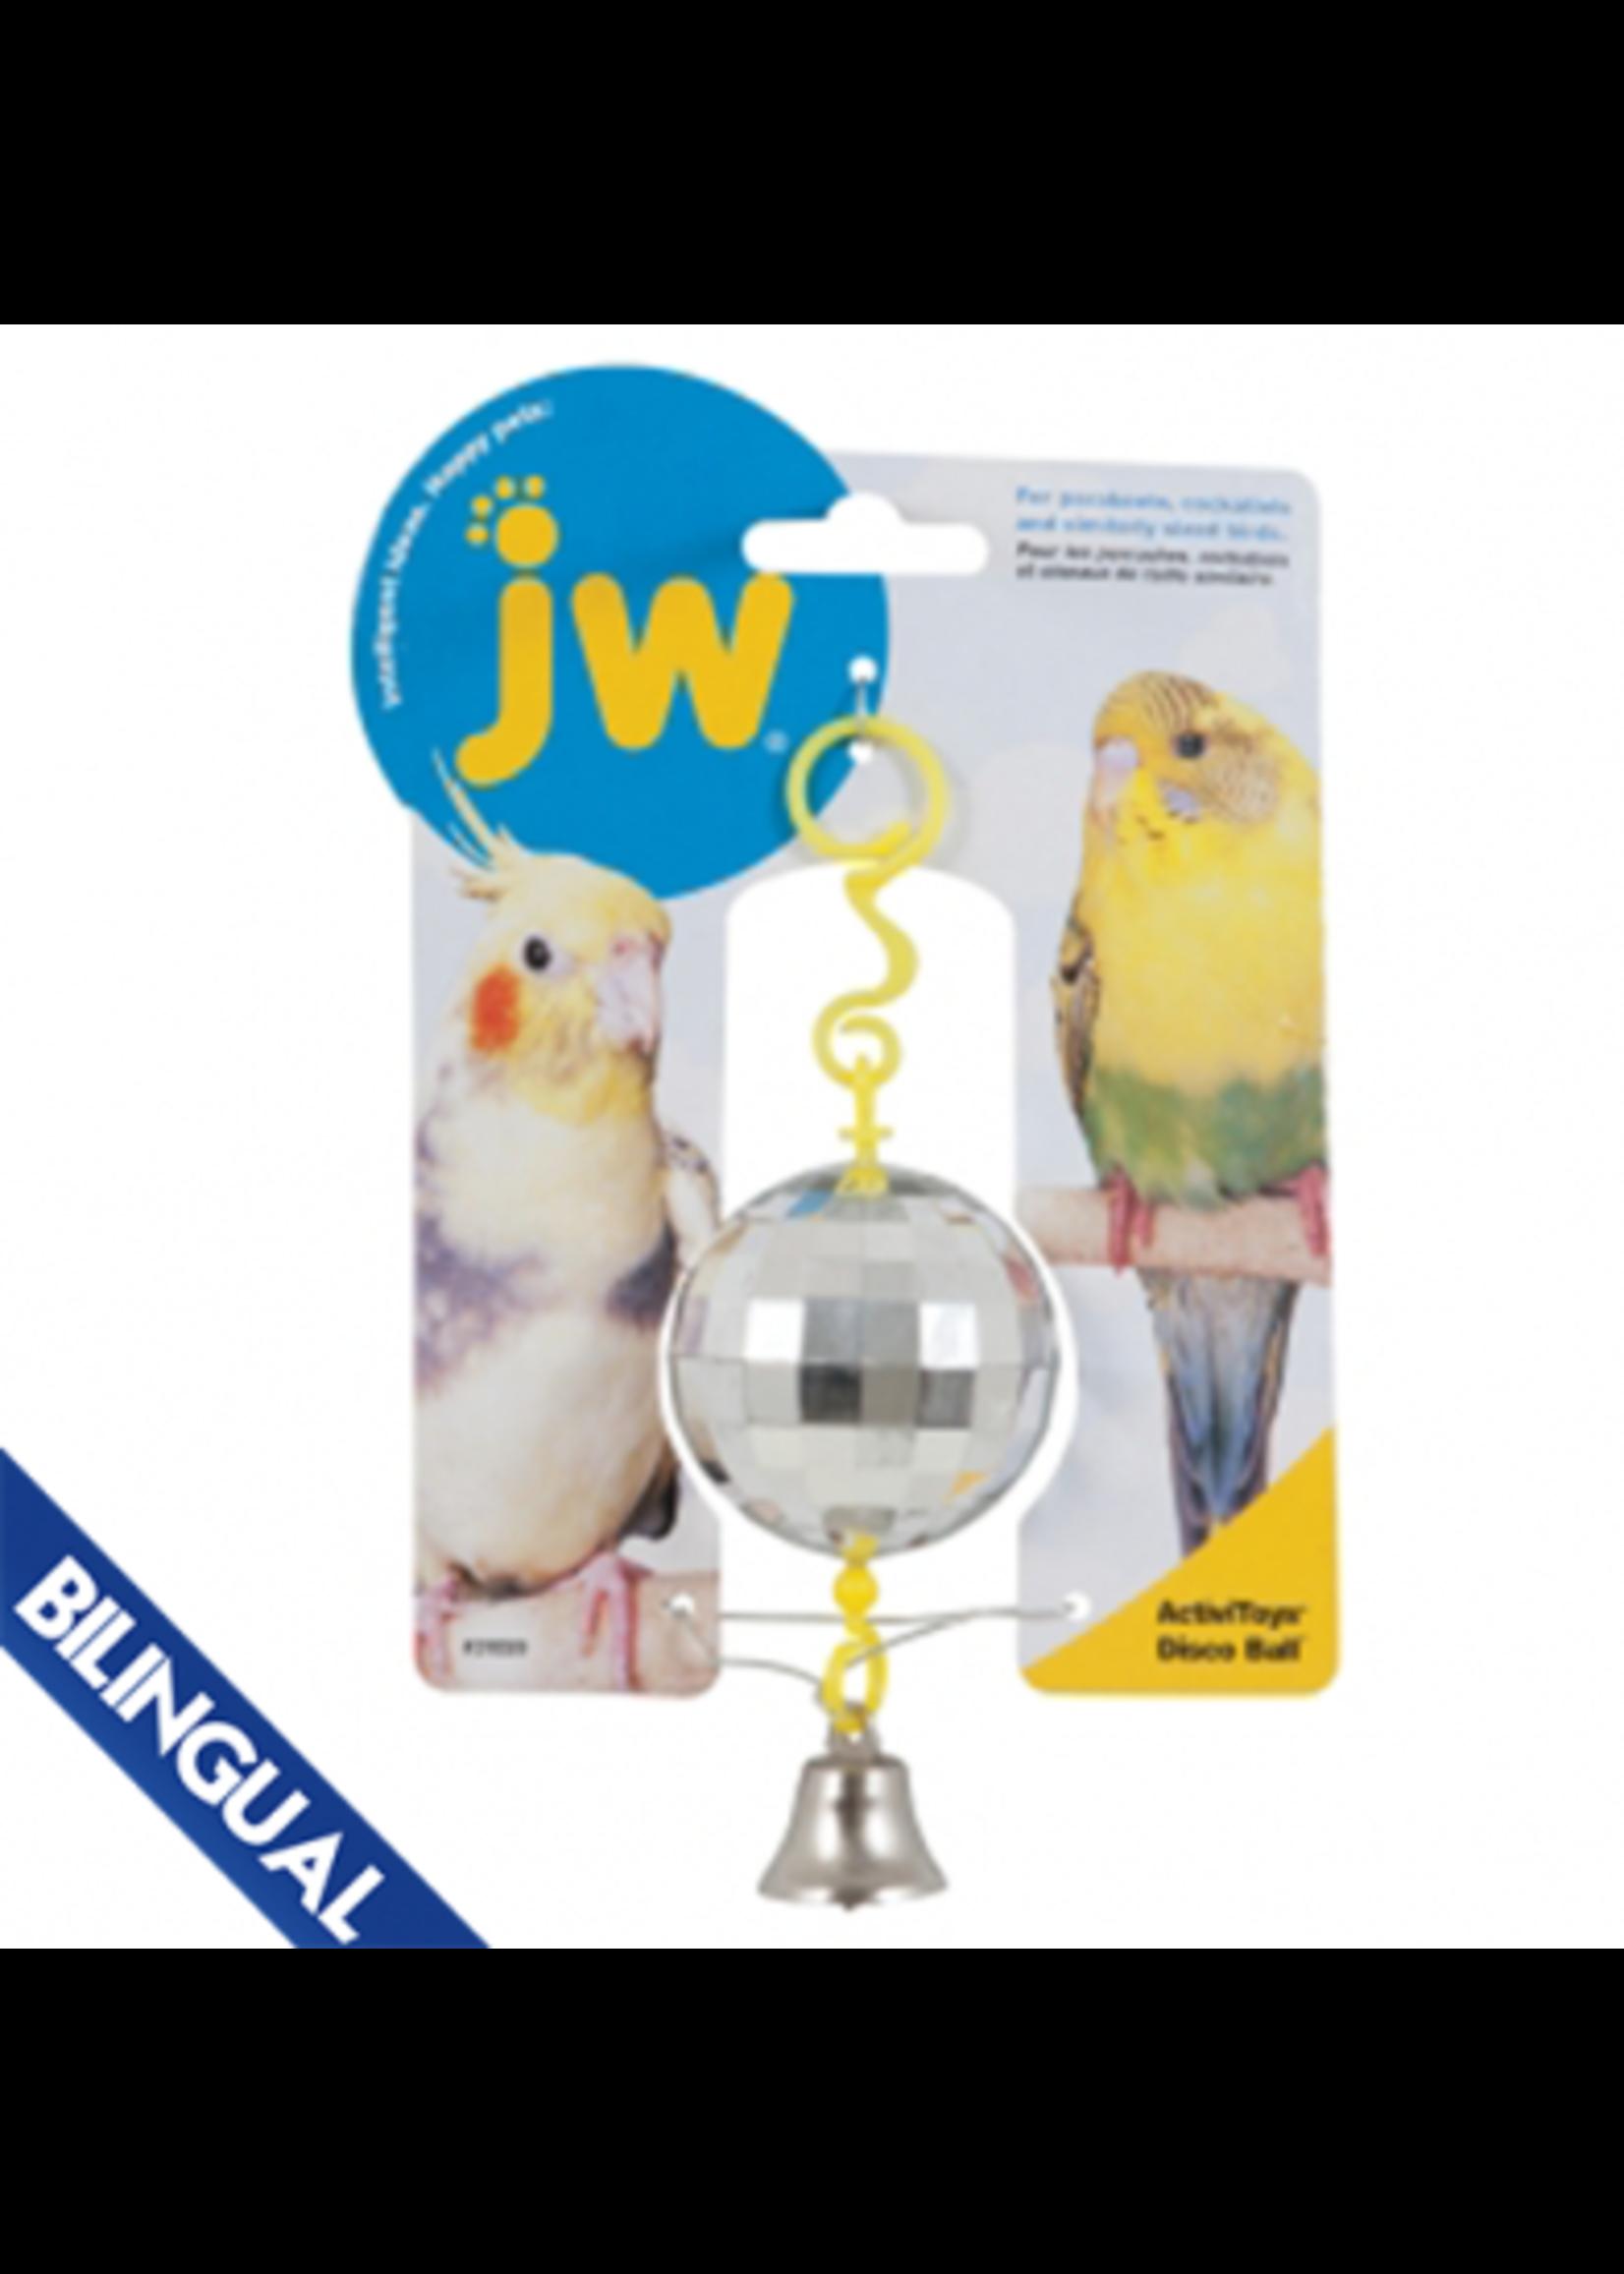 JW JW® ACTIVITOY® DISCO BALL BIRD TOY